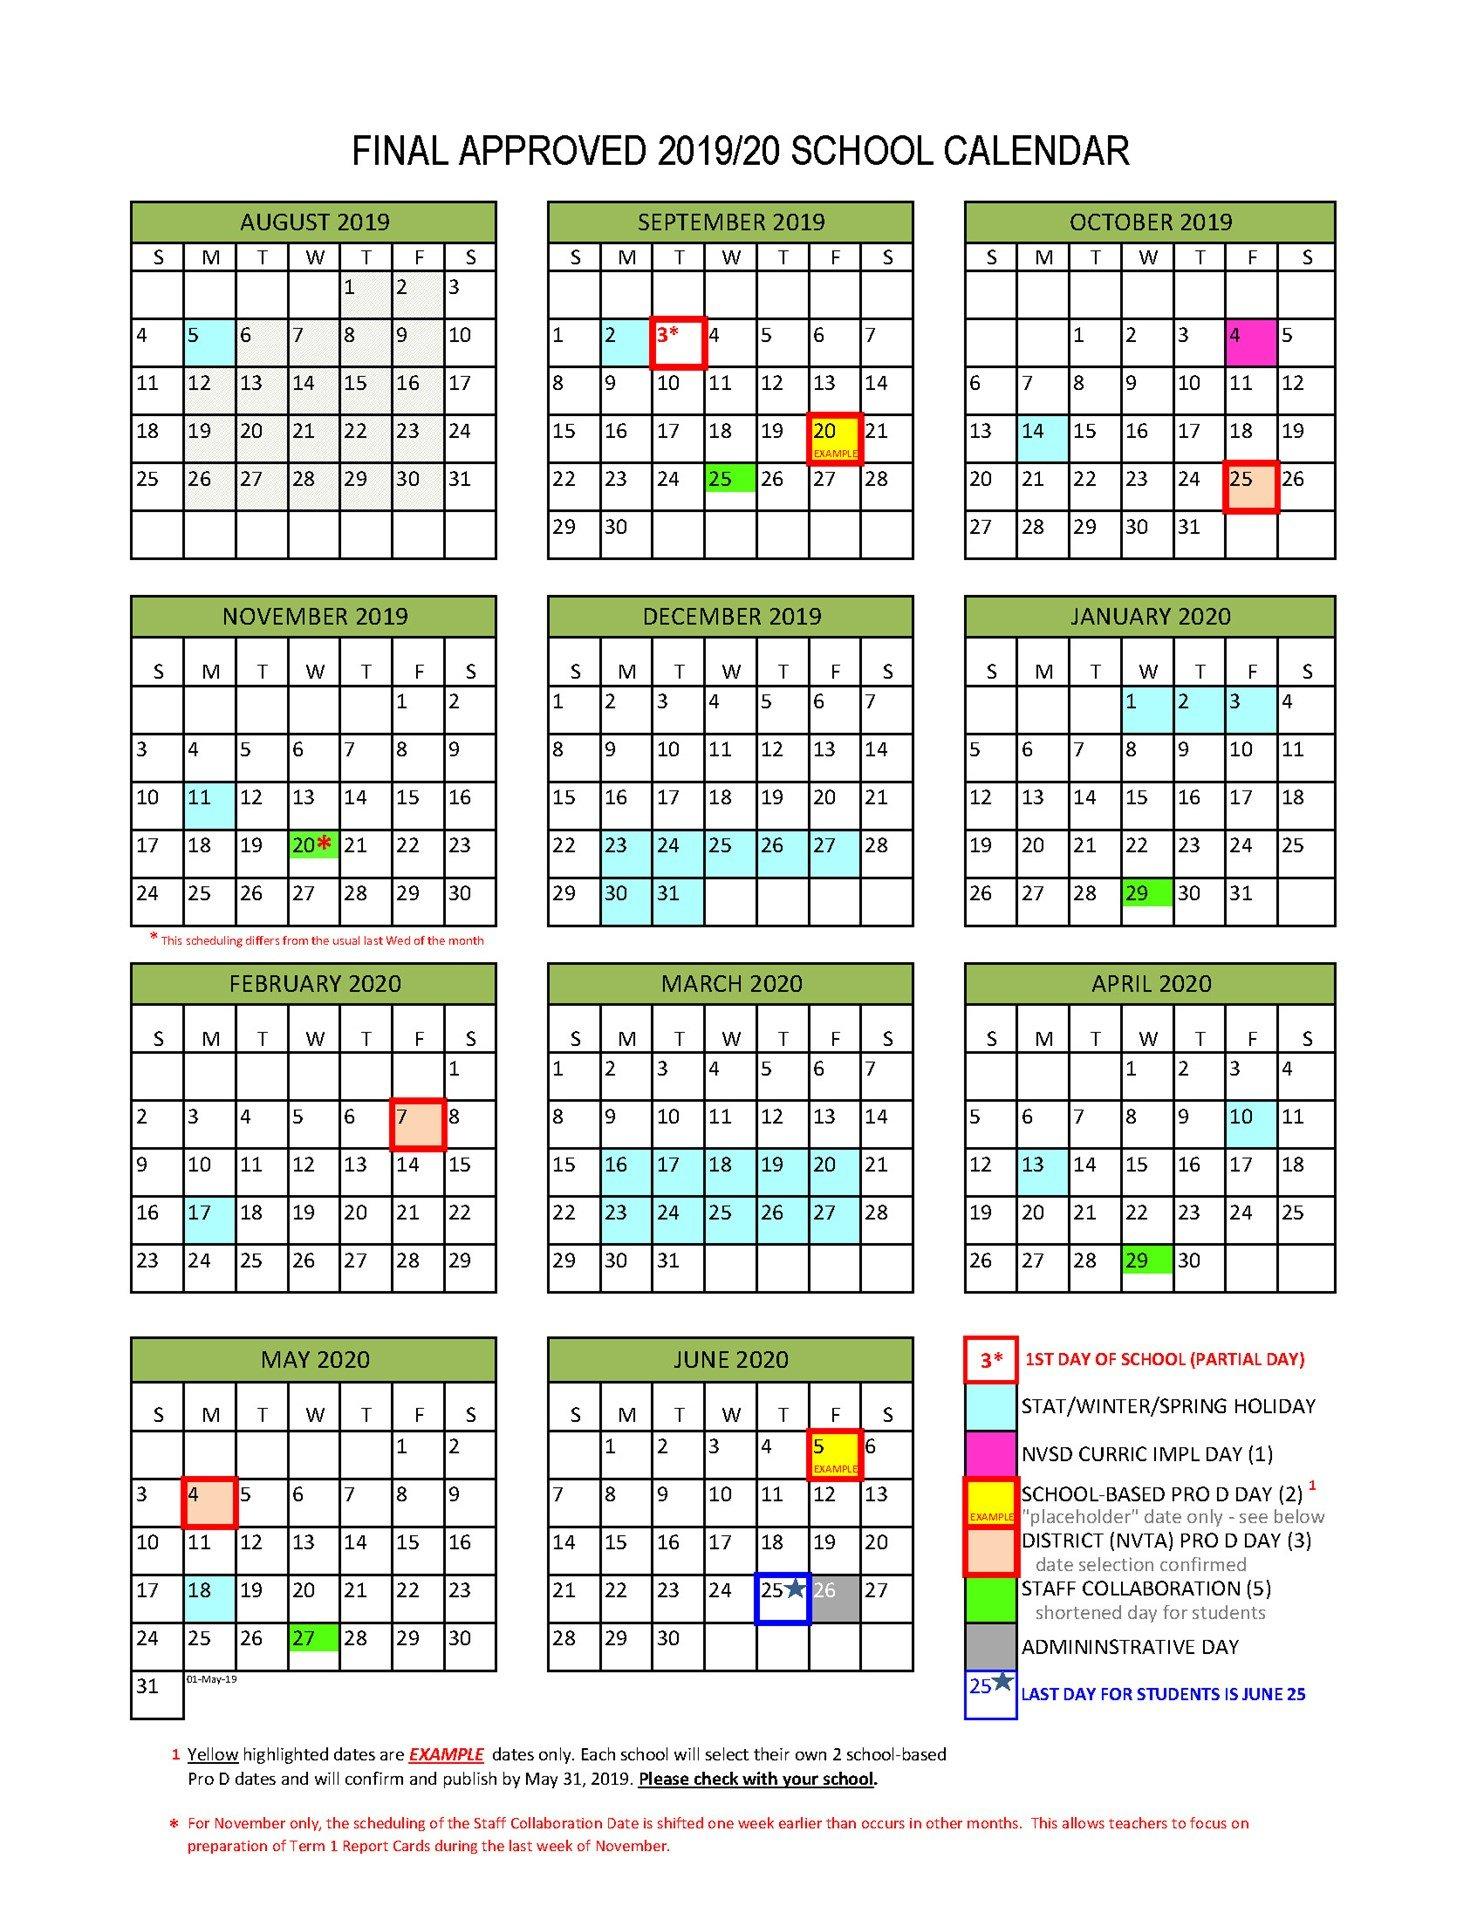 District Calendar - North Vancouver School District Cal U Calendar 2019